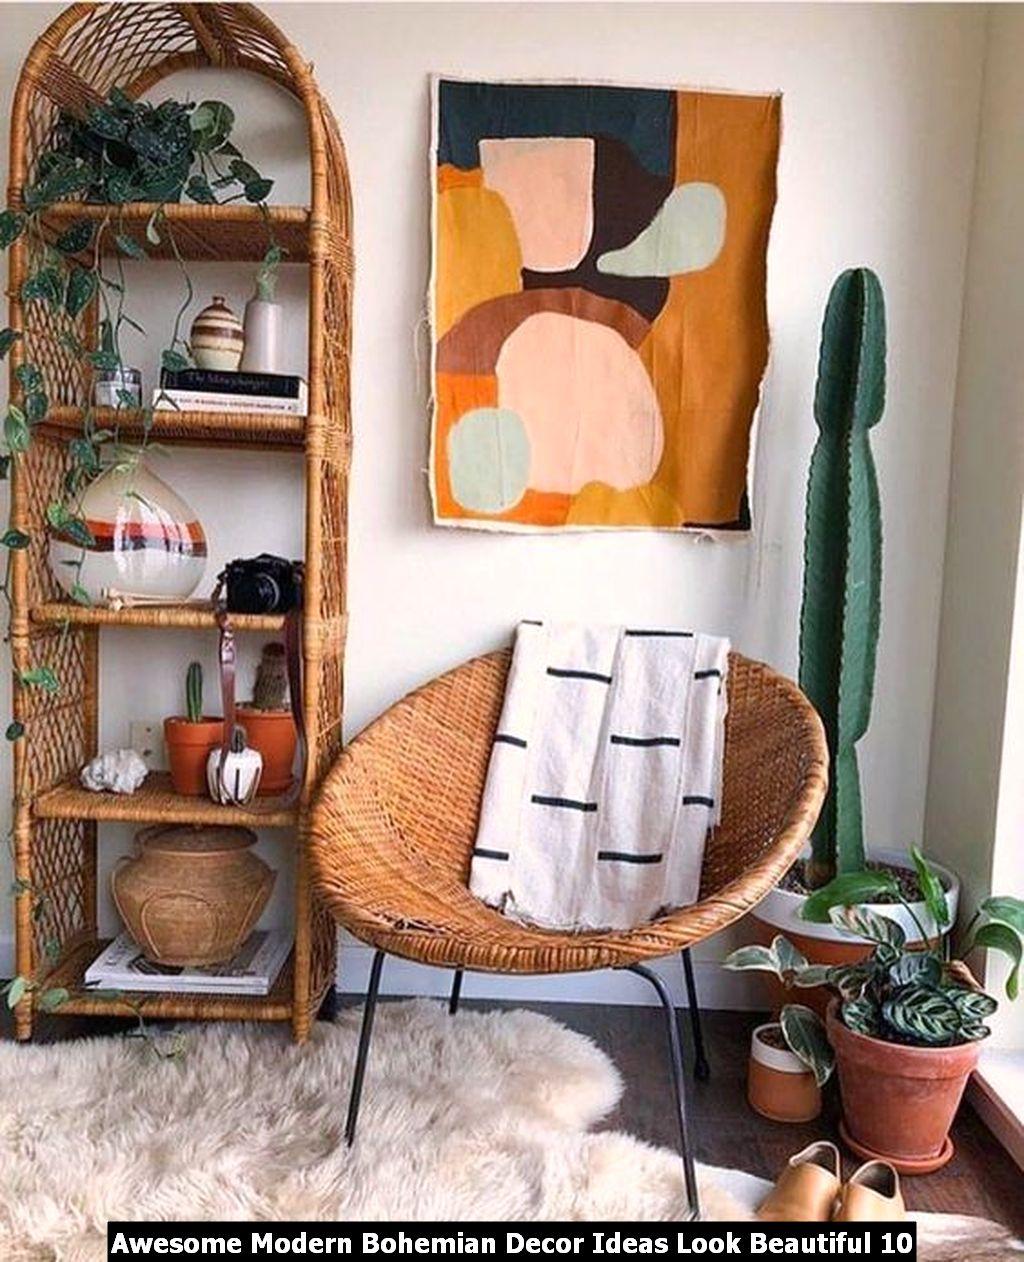 Awesome Modern Bohemian Decor Ideas Look Beautiful 10